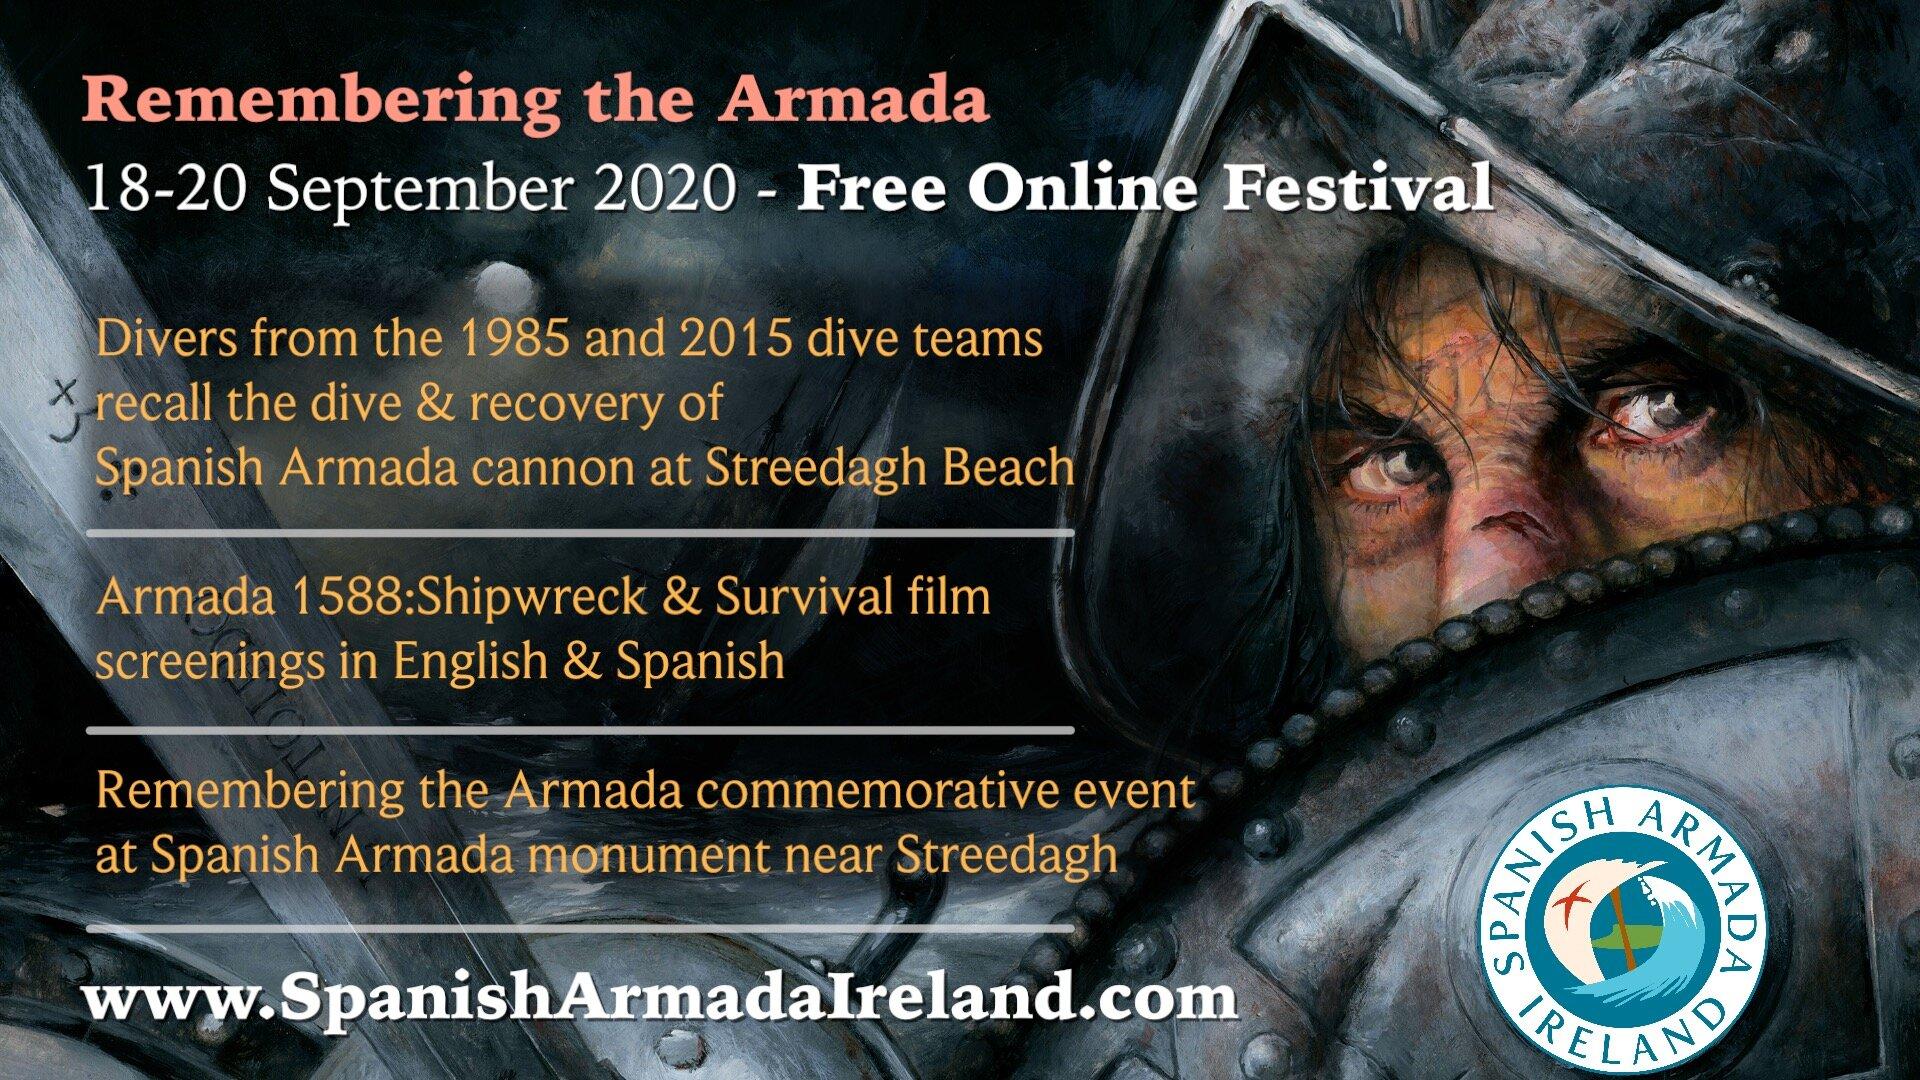 Remembering The Armada Festival 2020